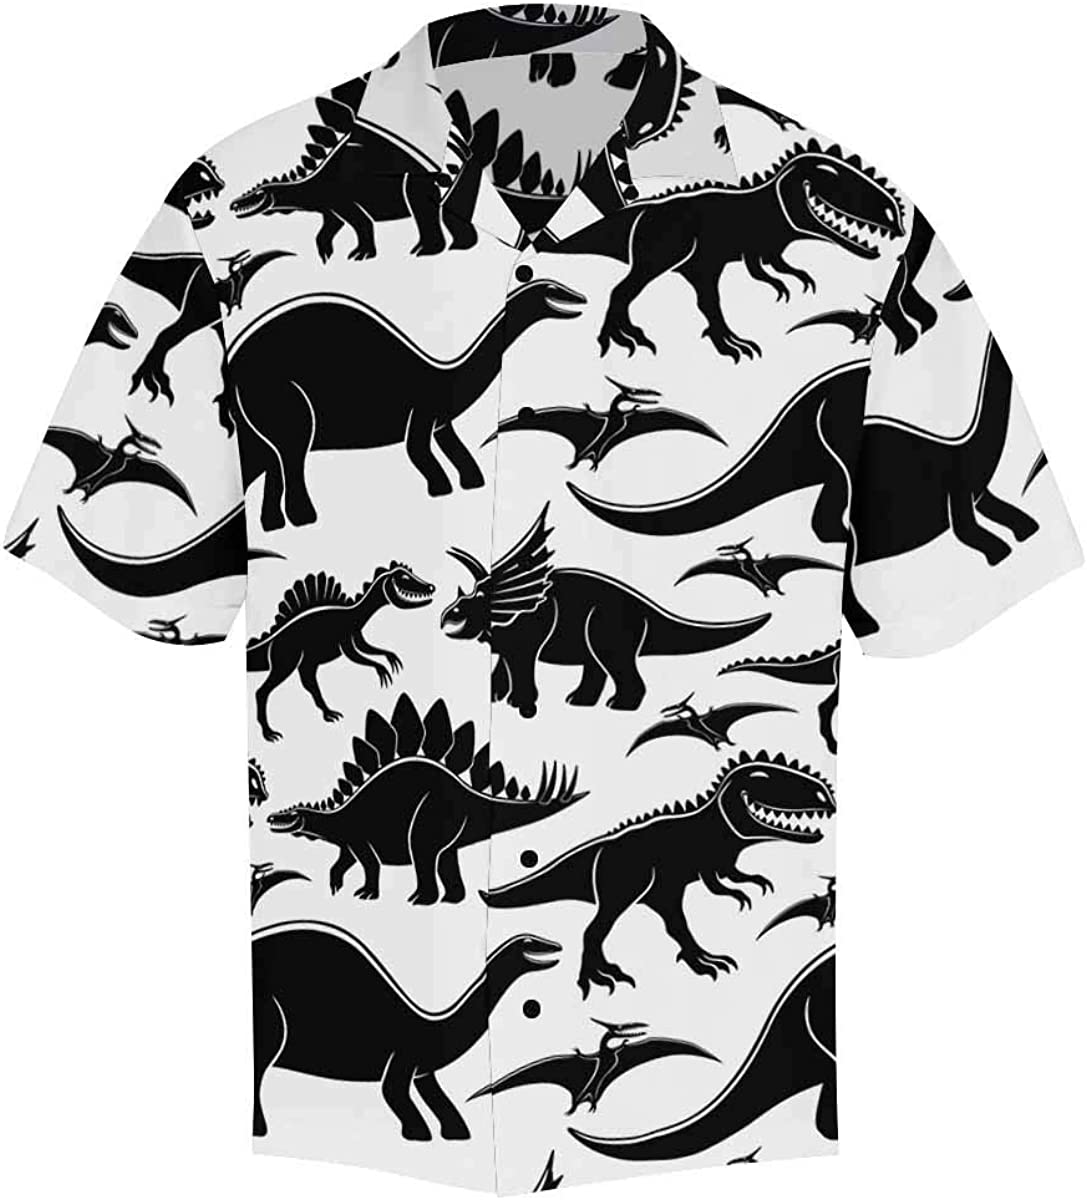 InterestPrint Men's Casual Button Down Short Sleeve Cute Panda Hawaiian Shirt (S-5XL)